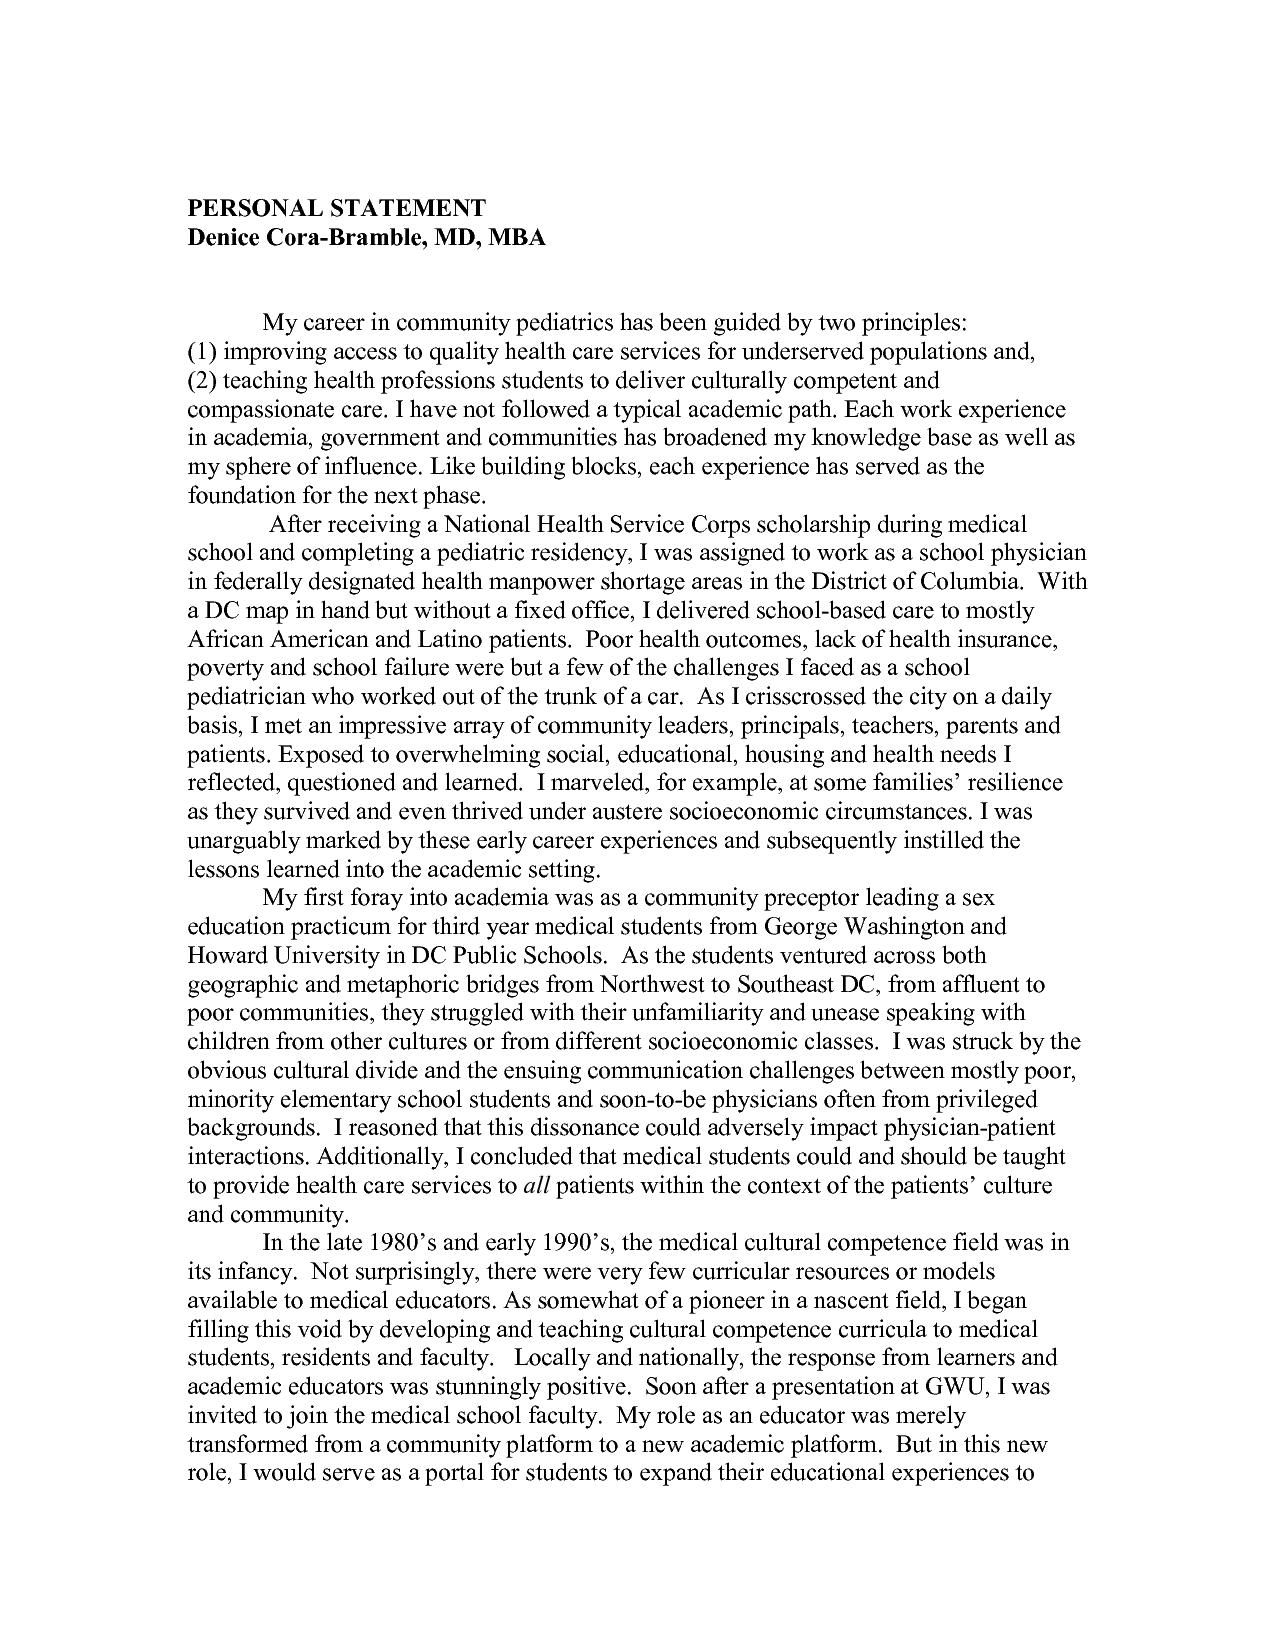 Essay for master degree application sample best dissertation methodology writer websites for college